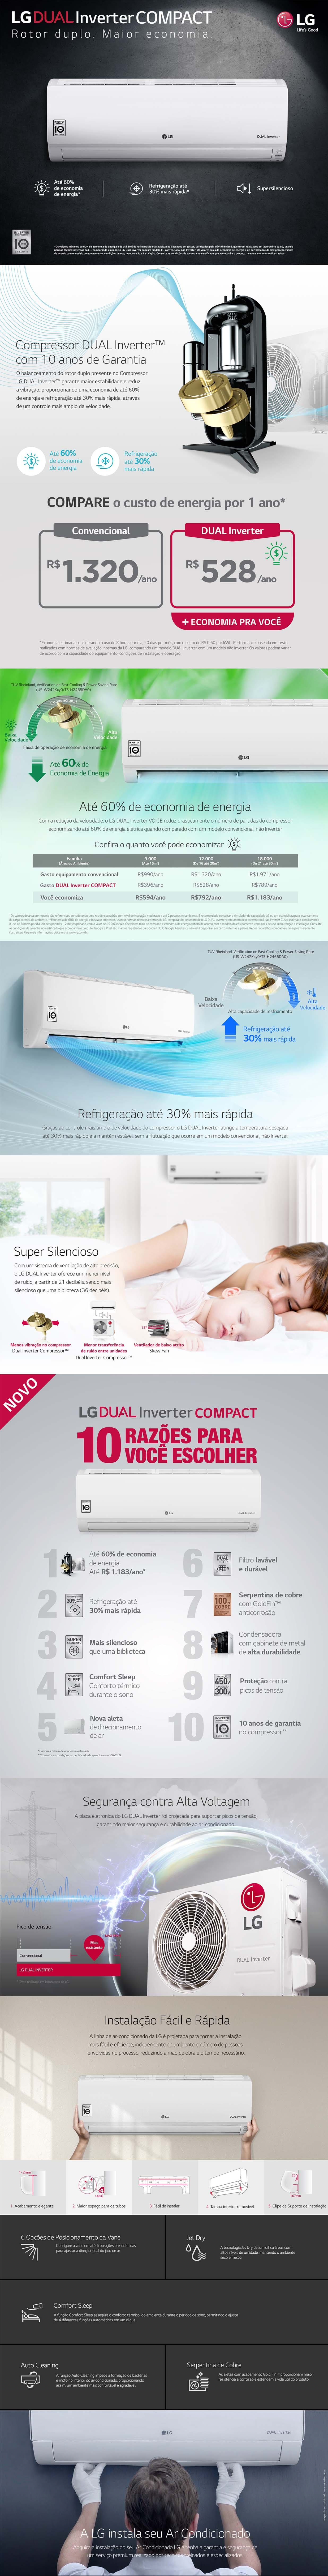 Ar-Condicionado Split LG Dual Inverter Compact